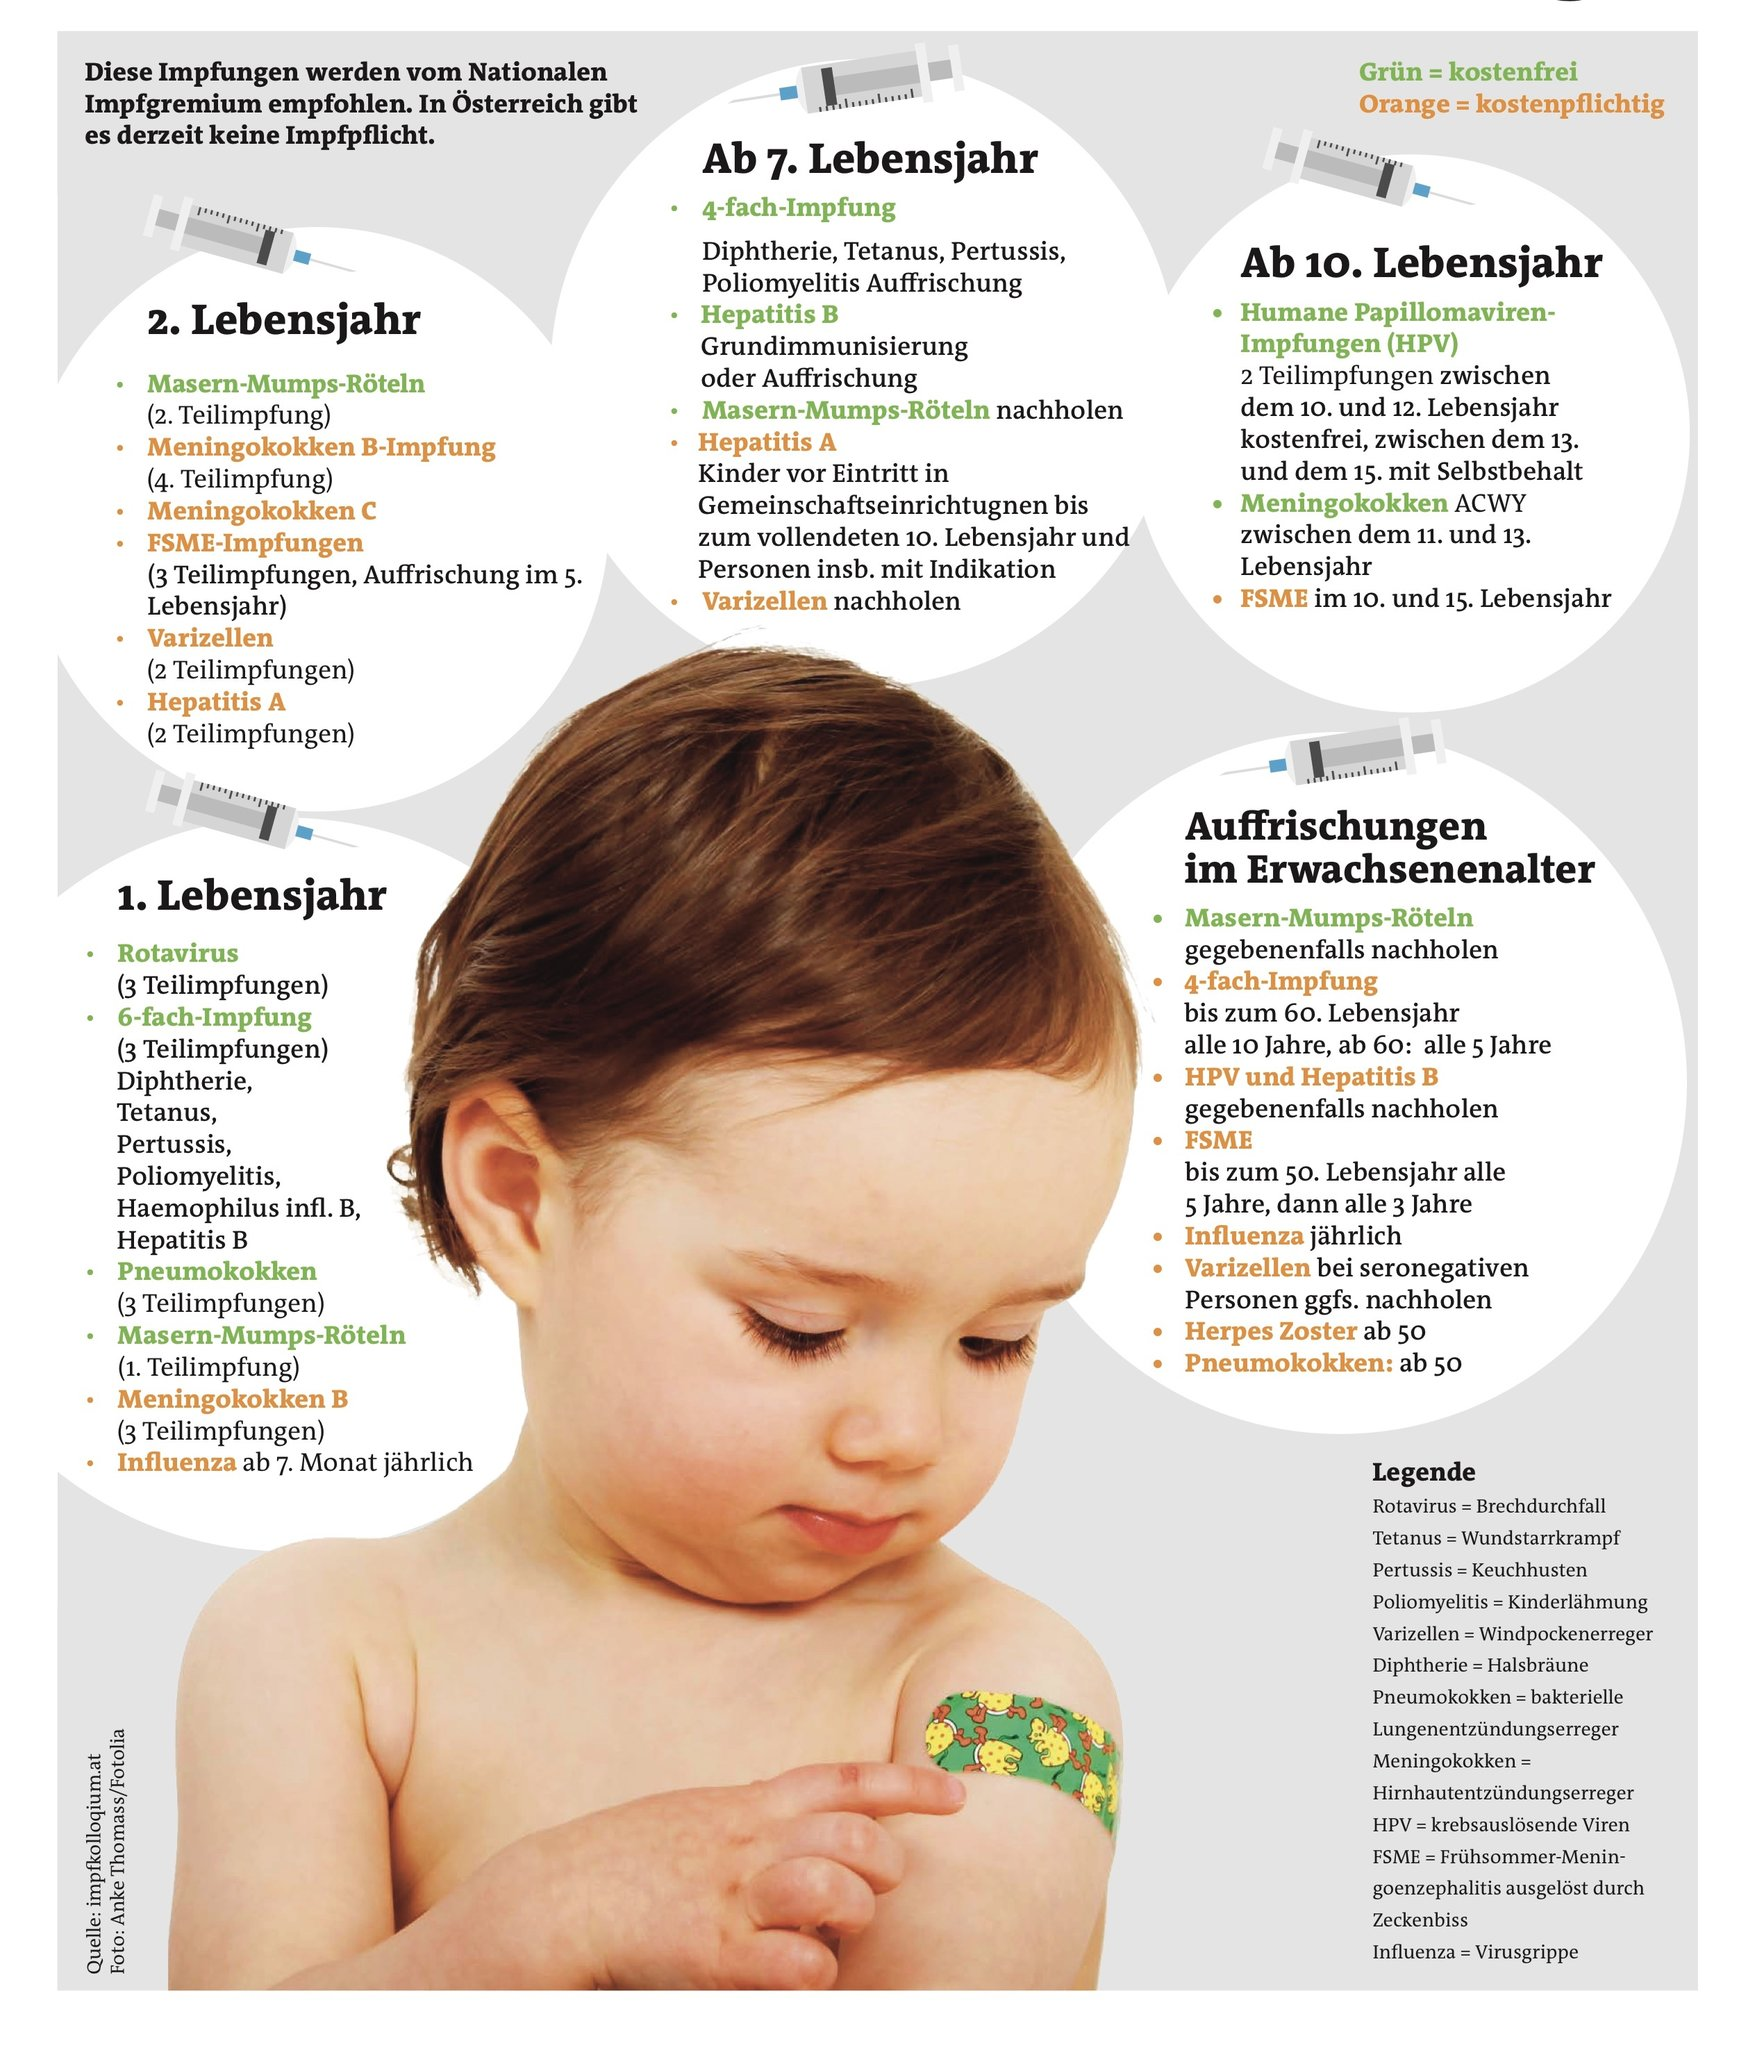 hpv impfung jungen merkblatt